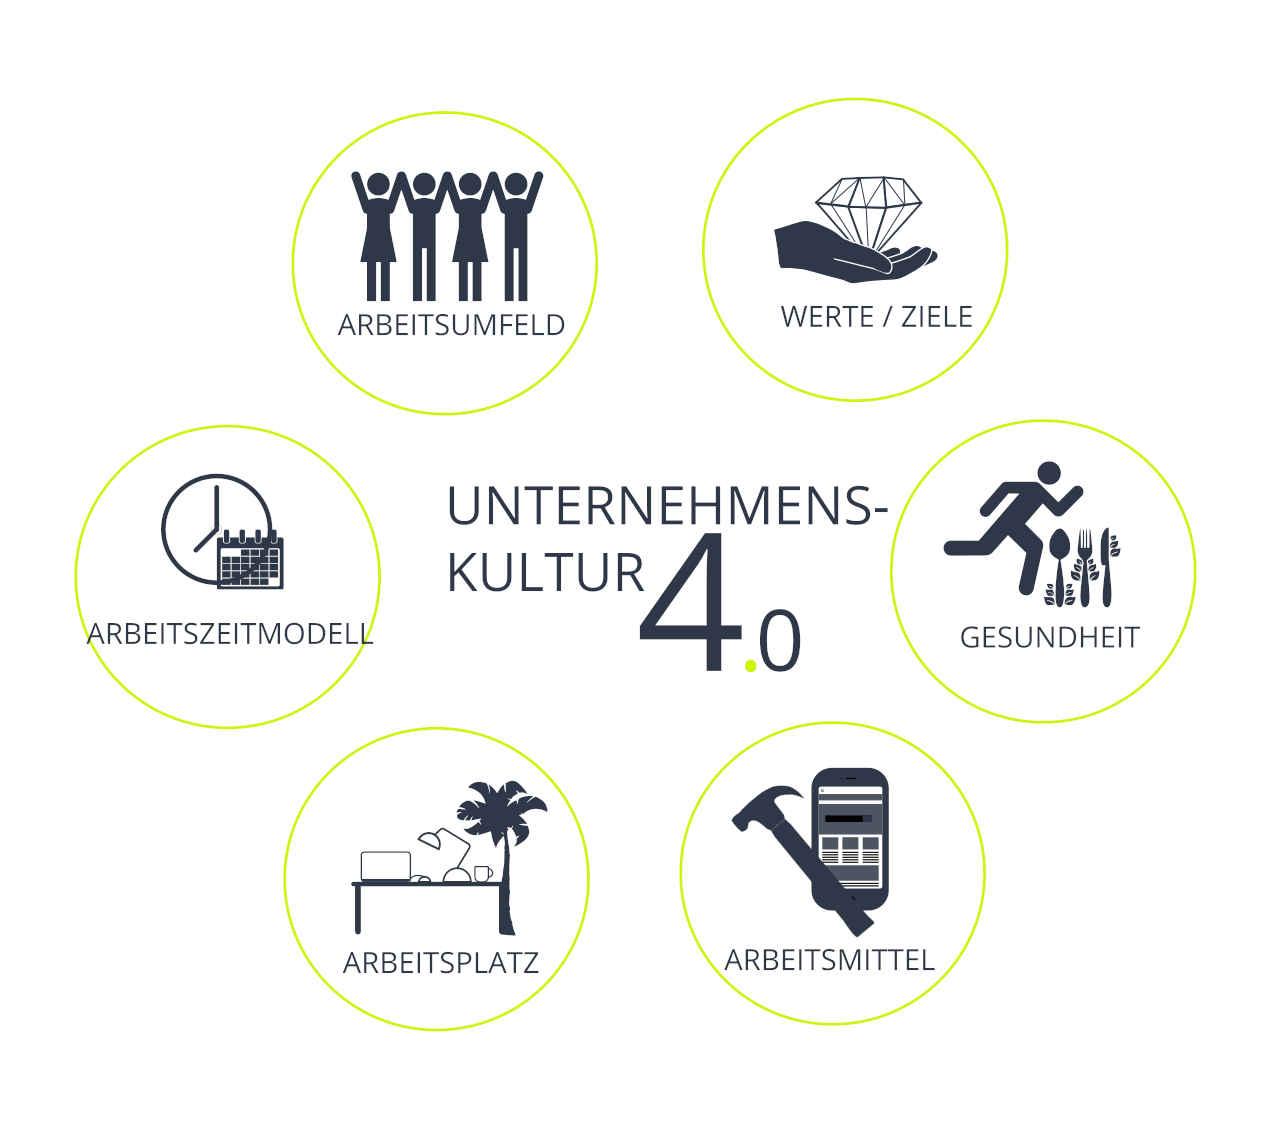 BERIAS Unternehmenskultur